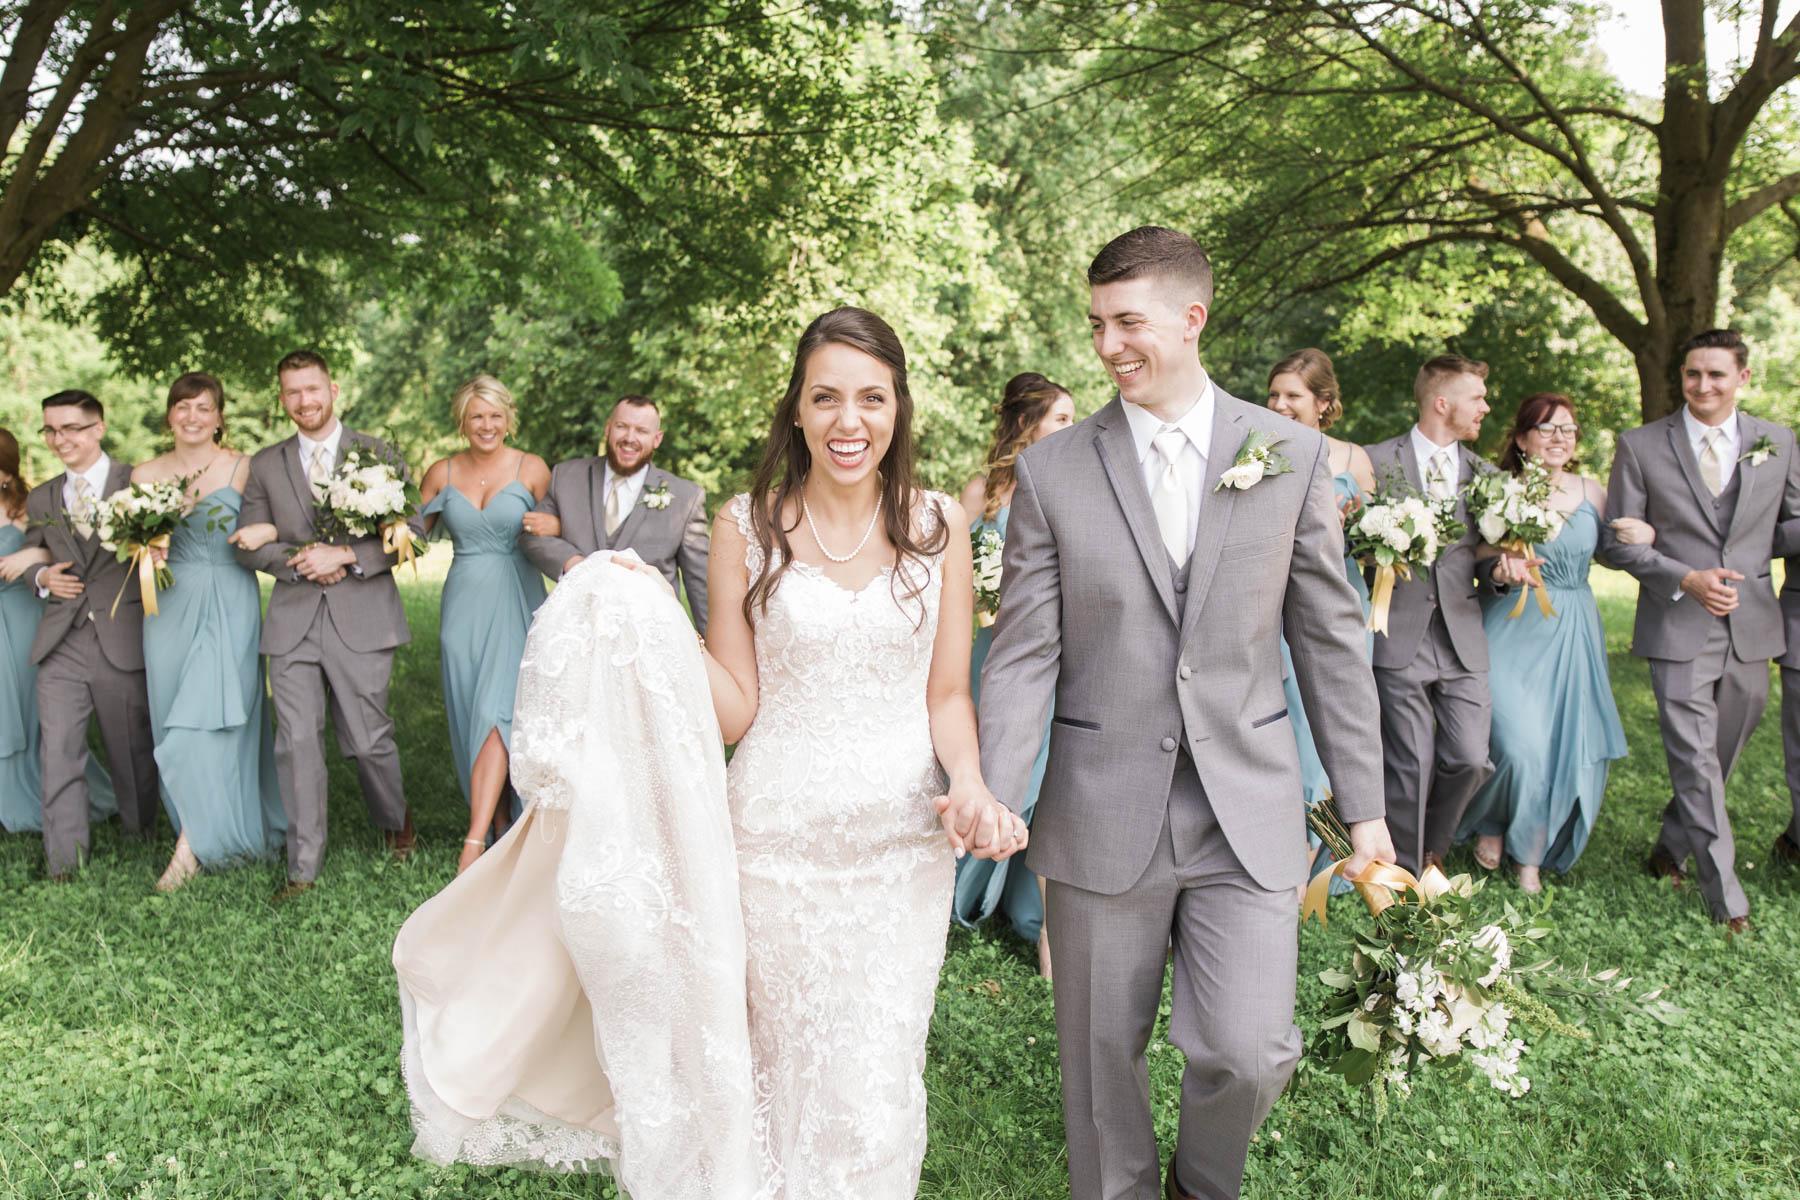 shotbychelsea_wedding_blog-23.jpg